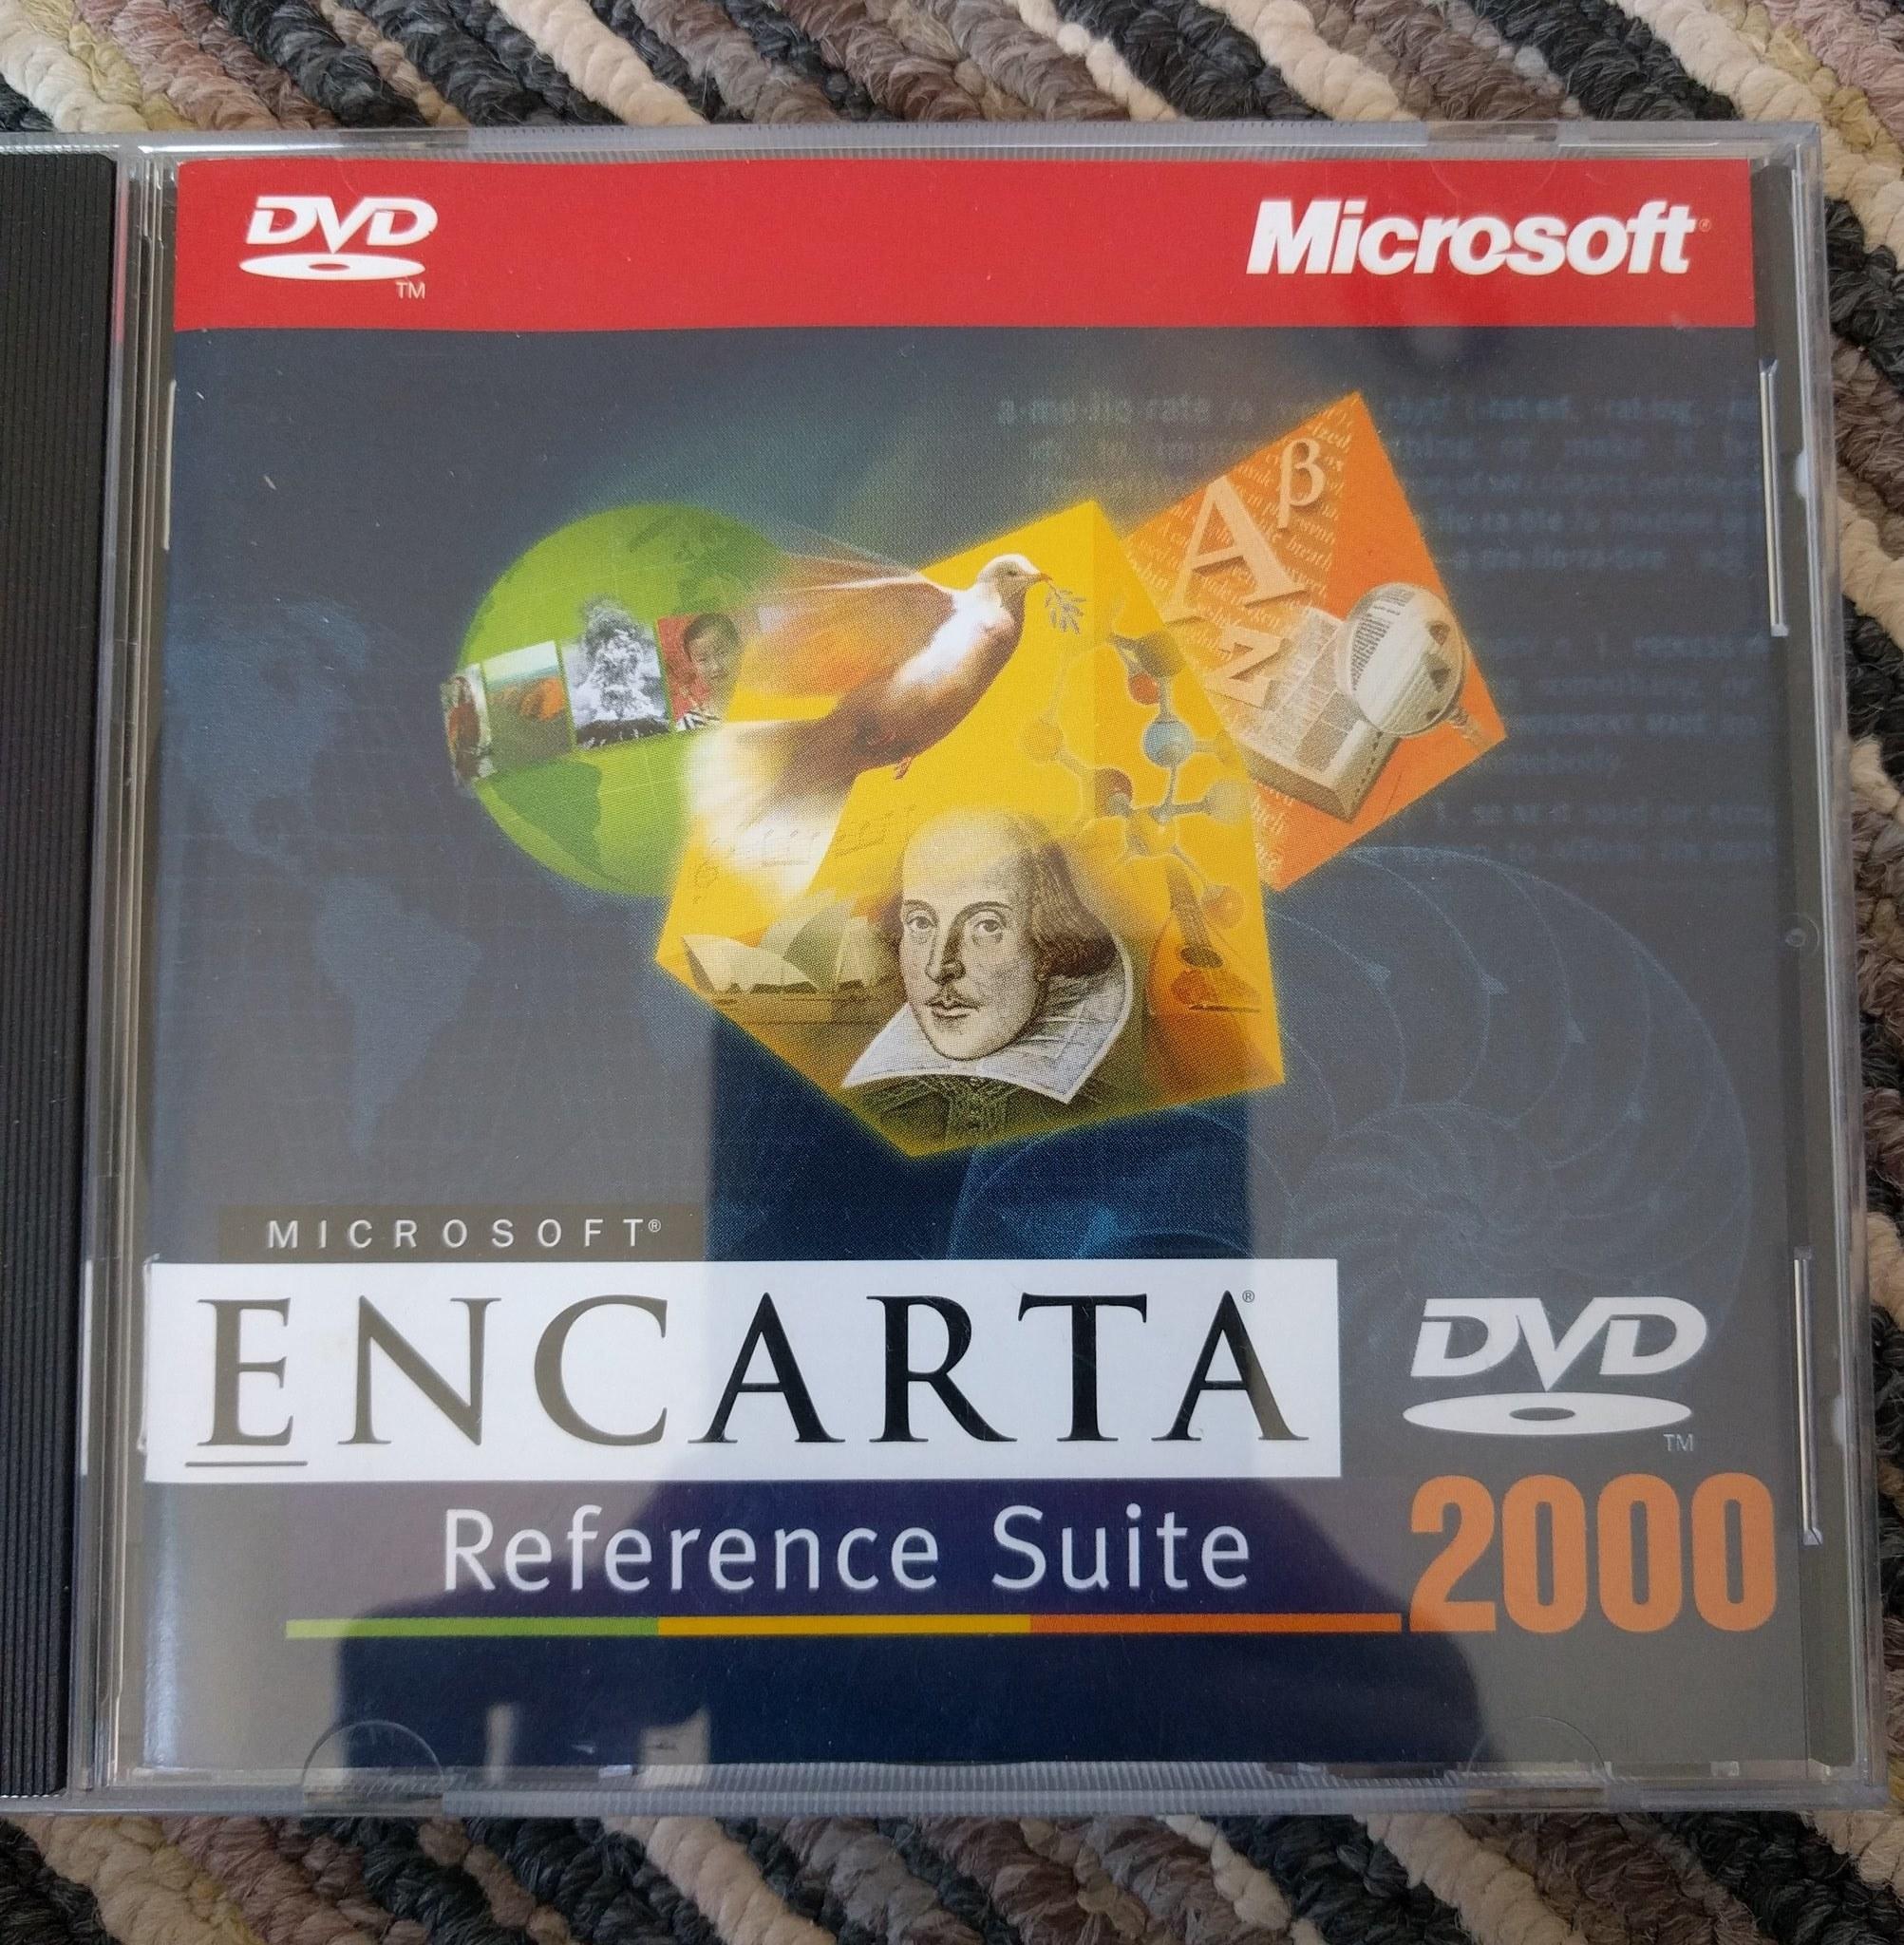 Microsoft Encarta 2000 DVD